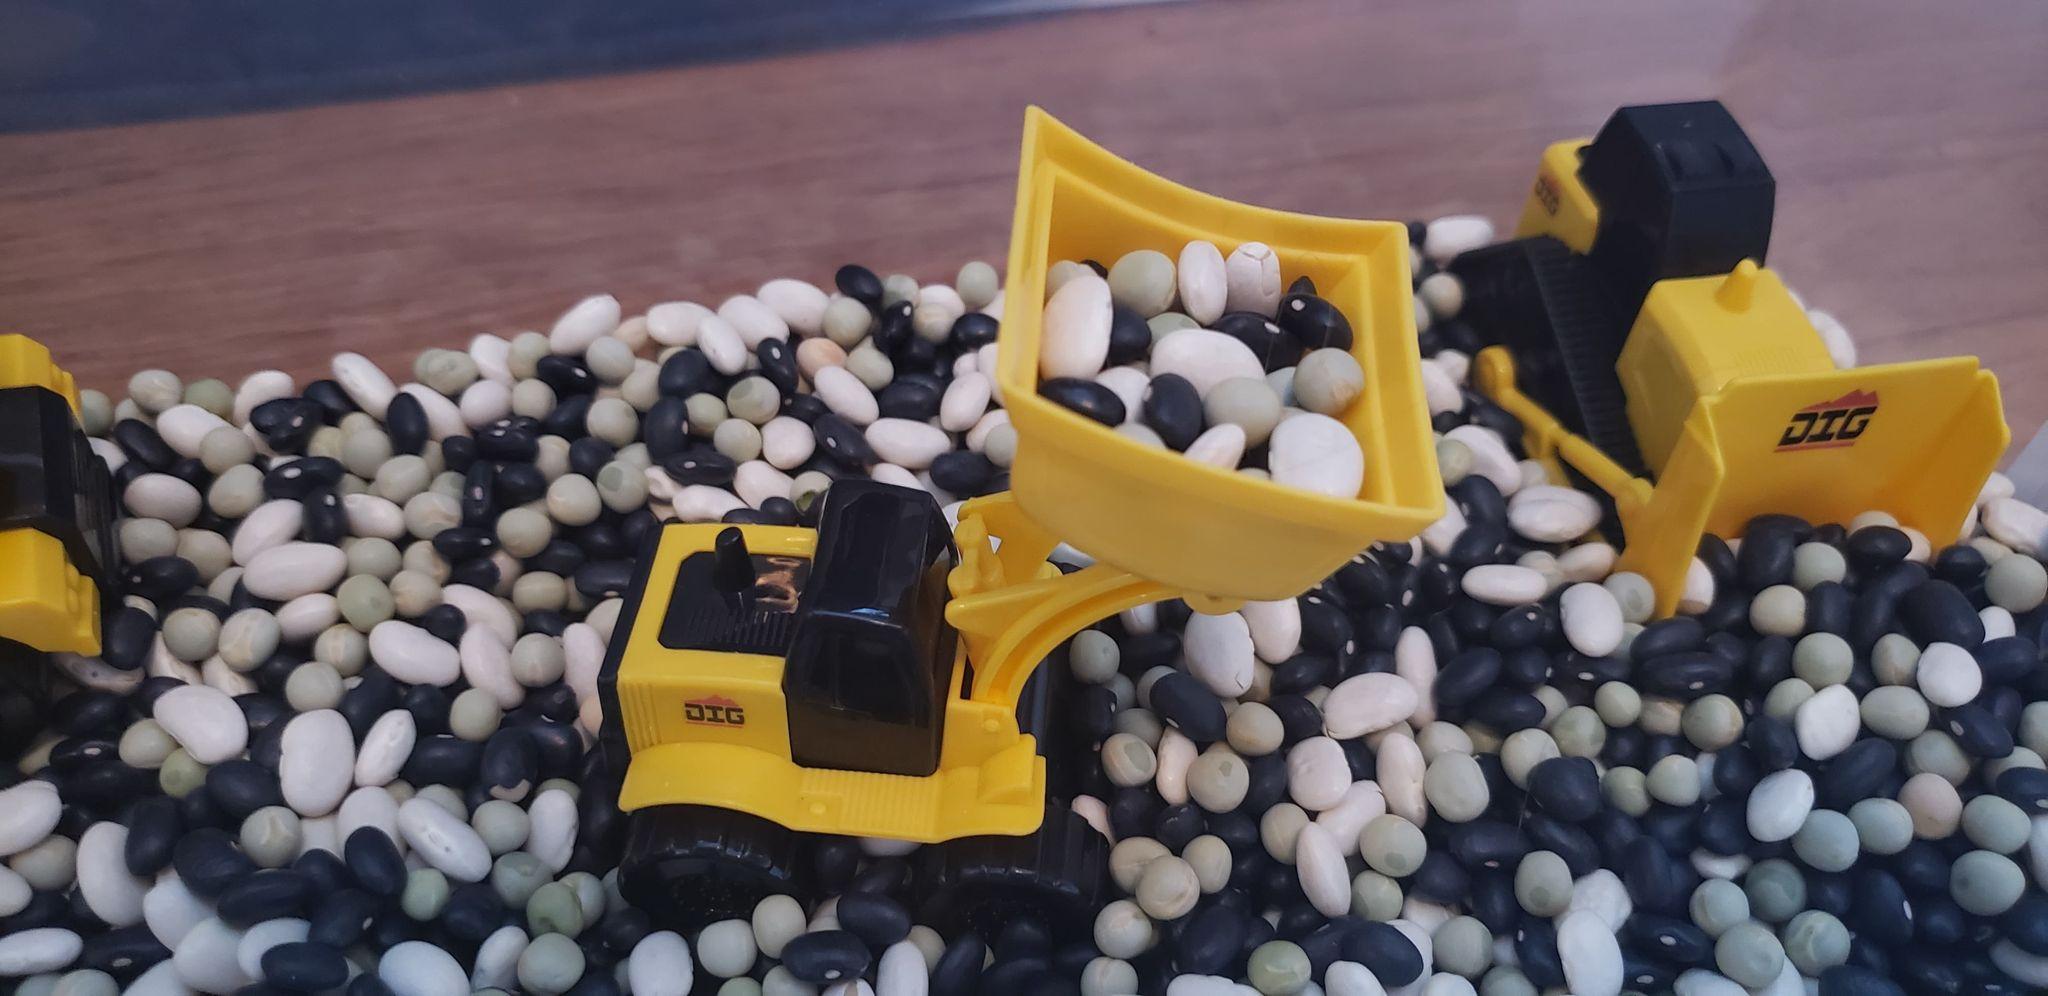 mini bulldozer lifting dry beans